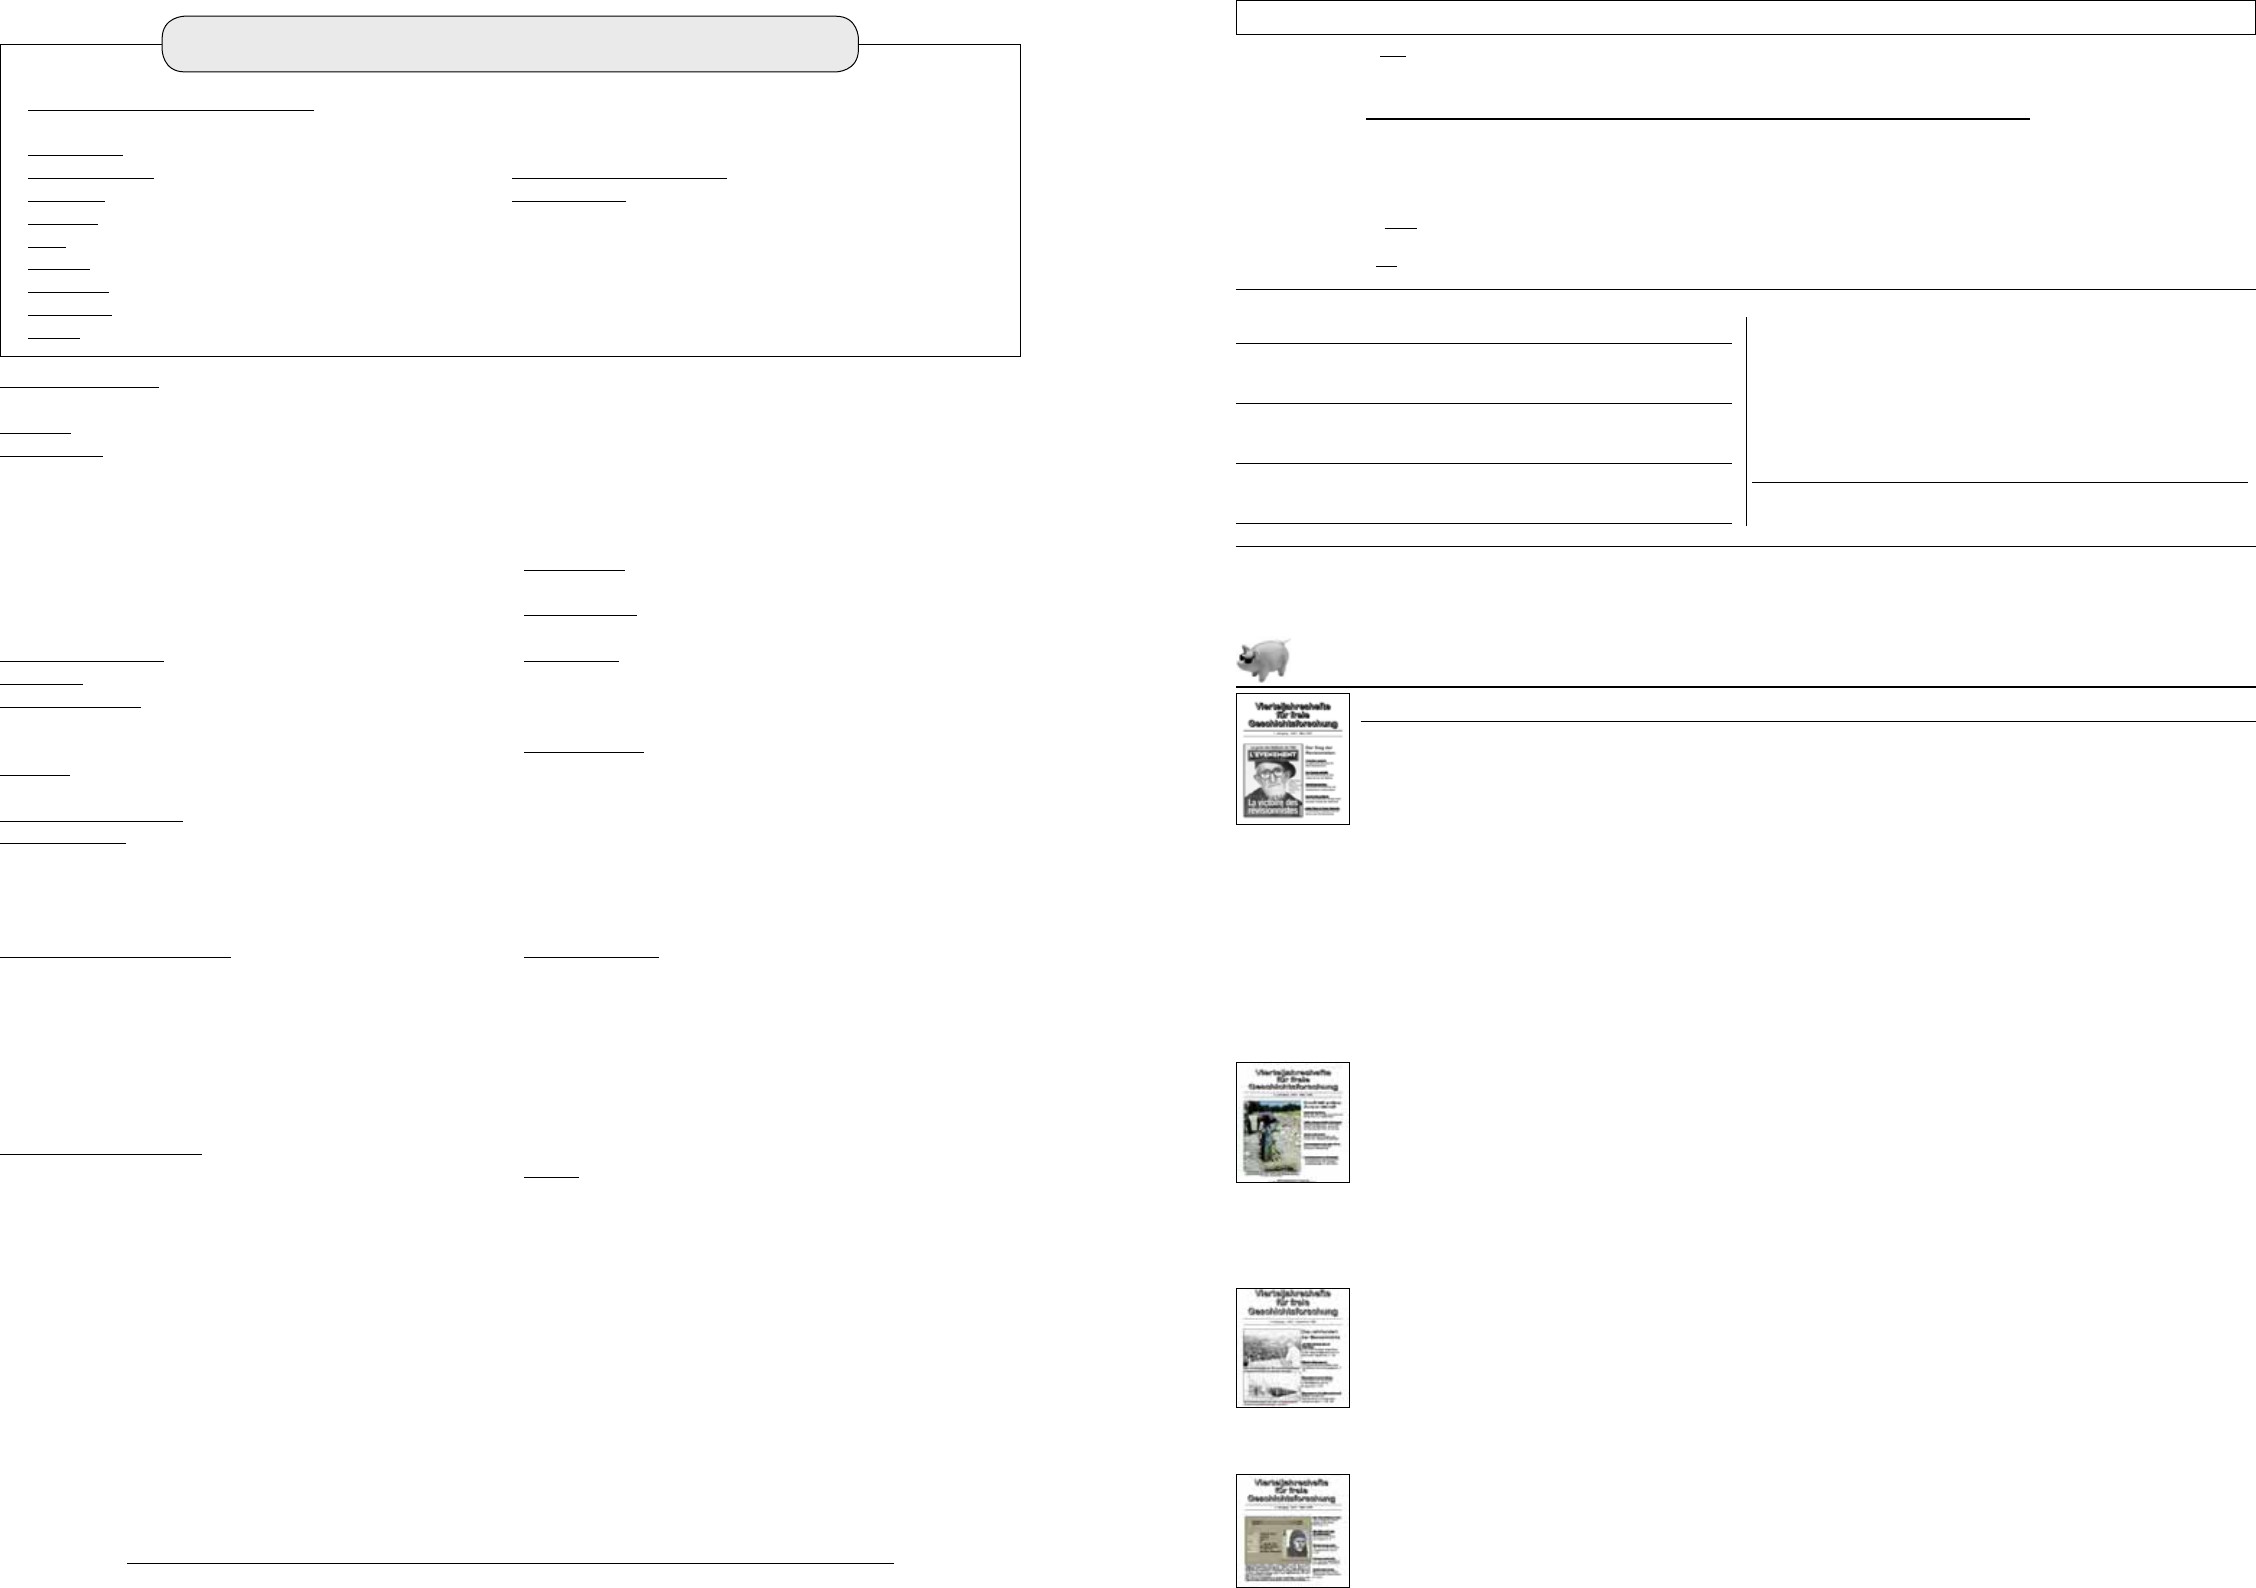 Teddybär Mit Herz I Love You Ausmalbilder Genial 3 03 [pdf Document] Sammlung